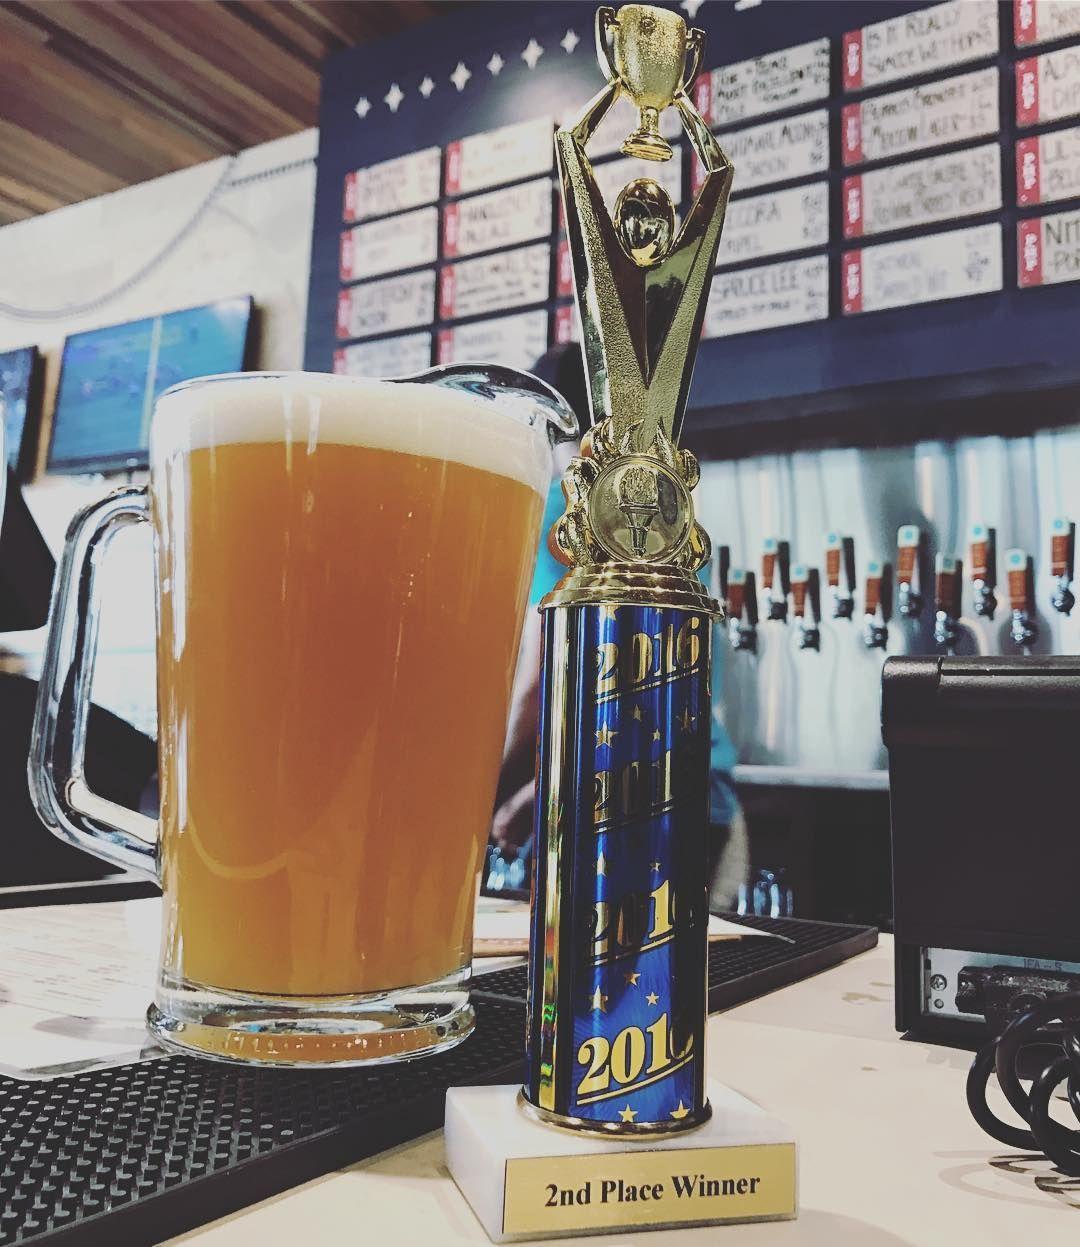 Celebration Pitcher Of Electric Jellyfish Pilsner Glass Craft Beer Glassware